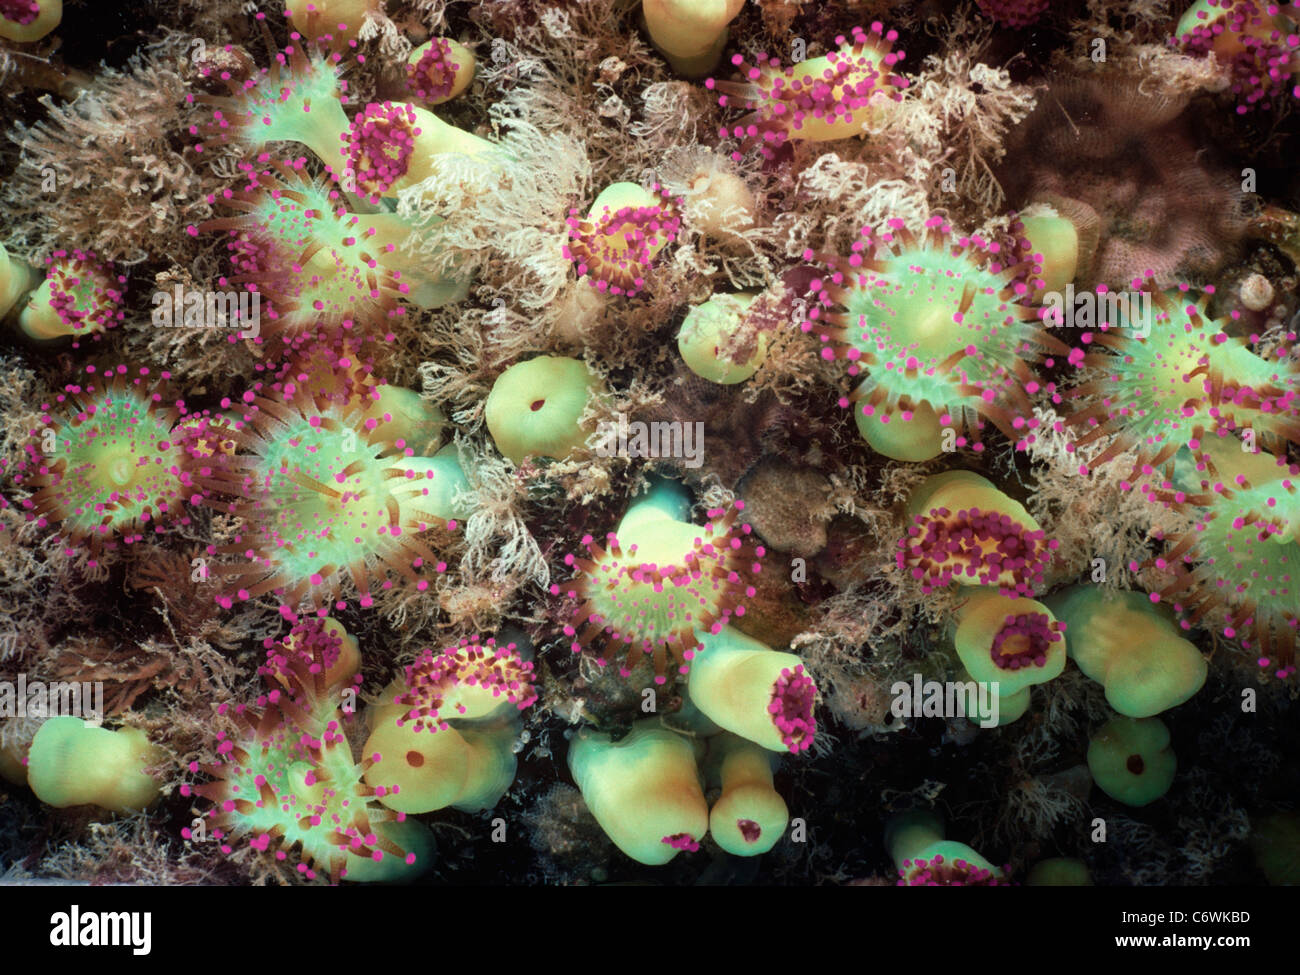 Colony of Jewel Anemones (Corynactis viridis) feeding. Brittany, France - Atlantic Ocean - Stock Image